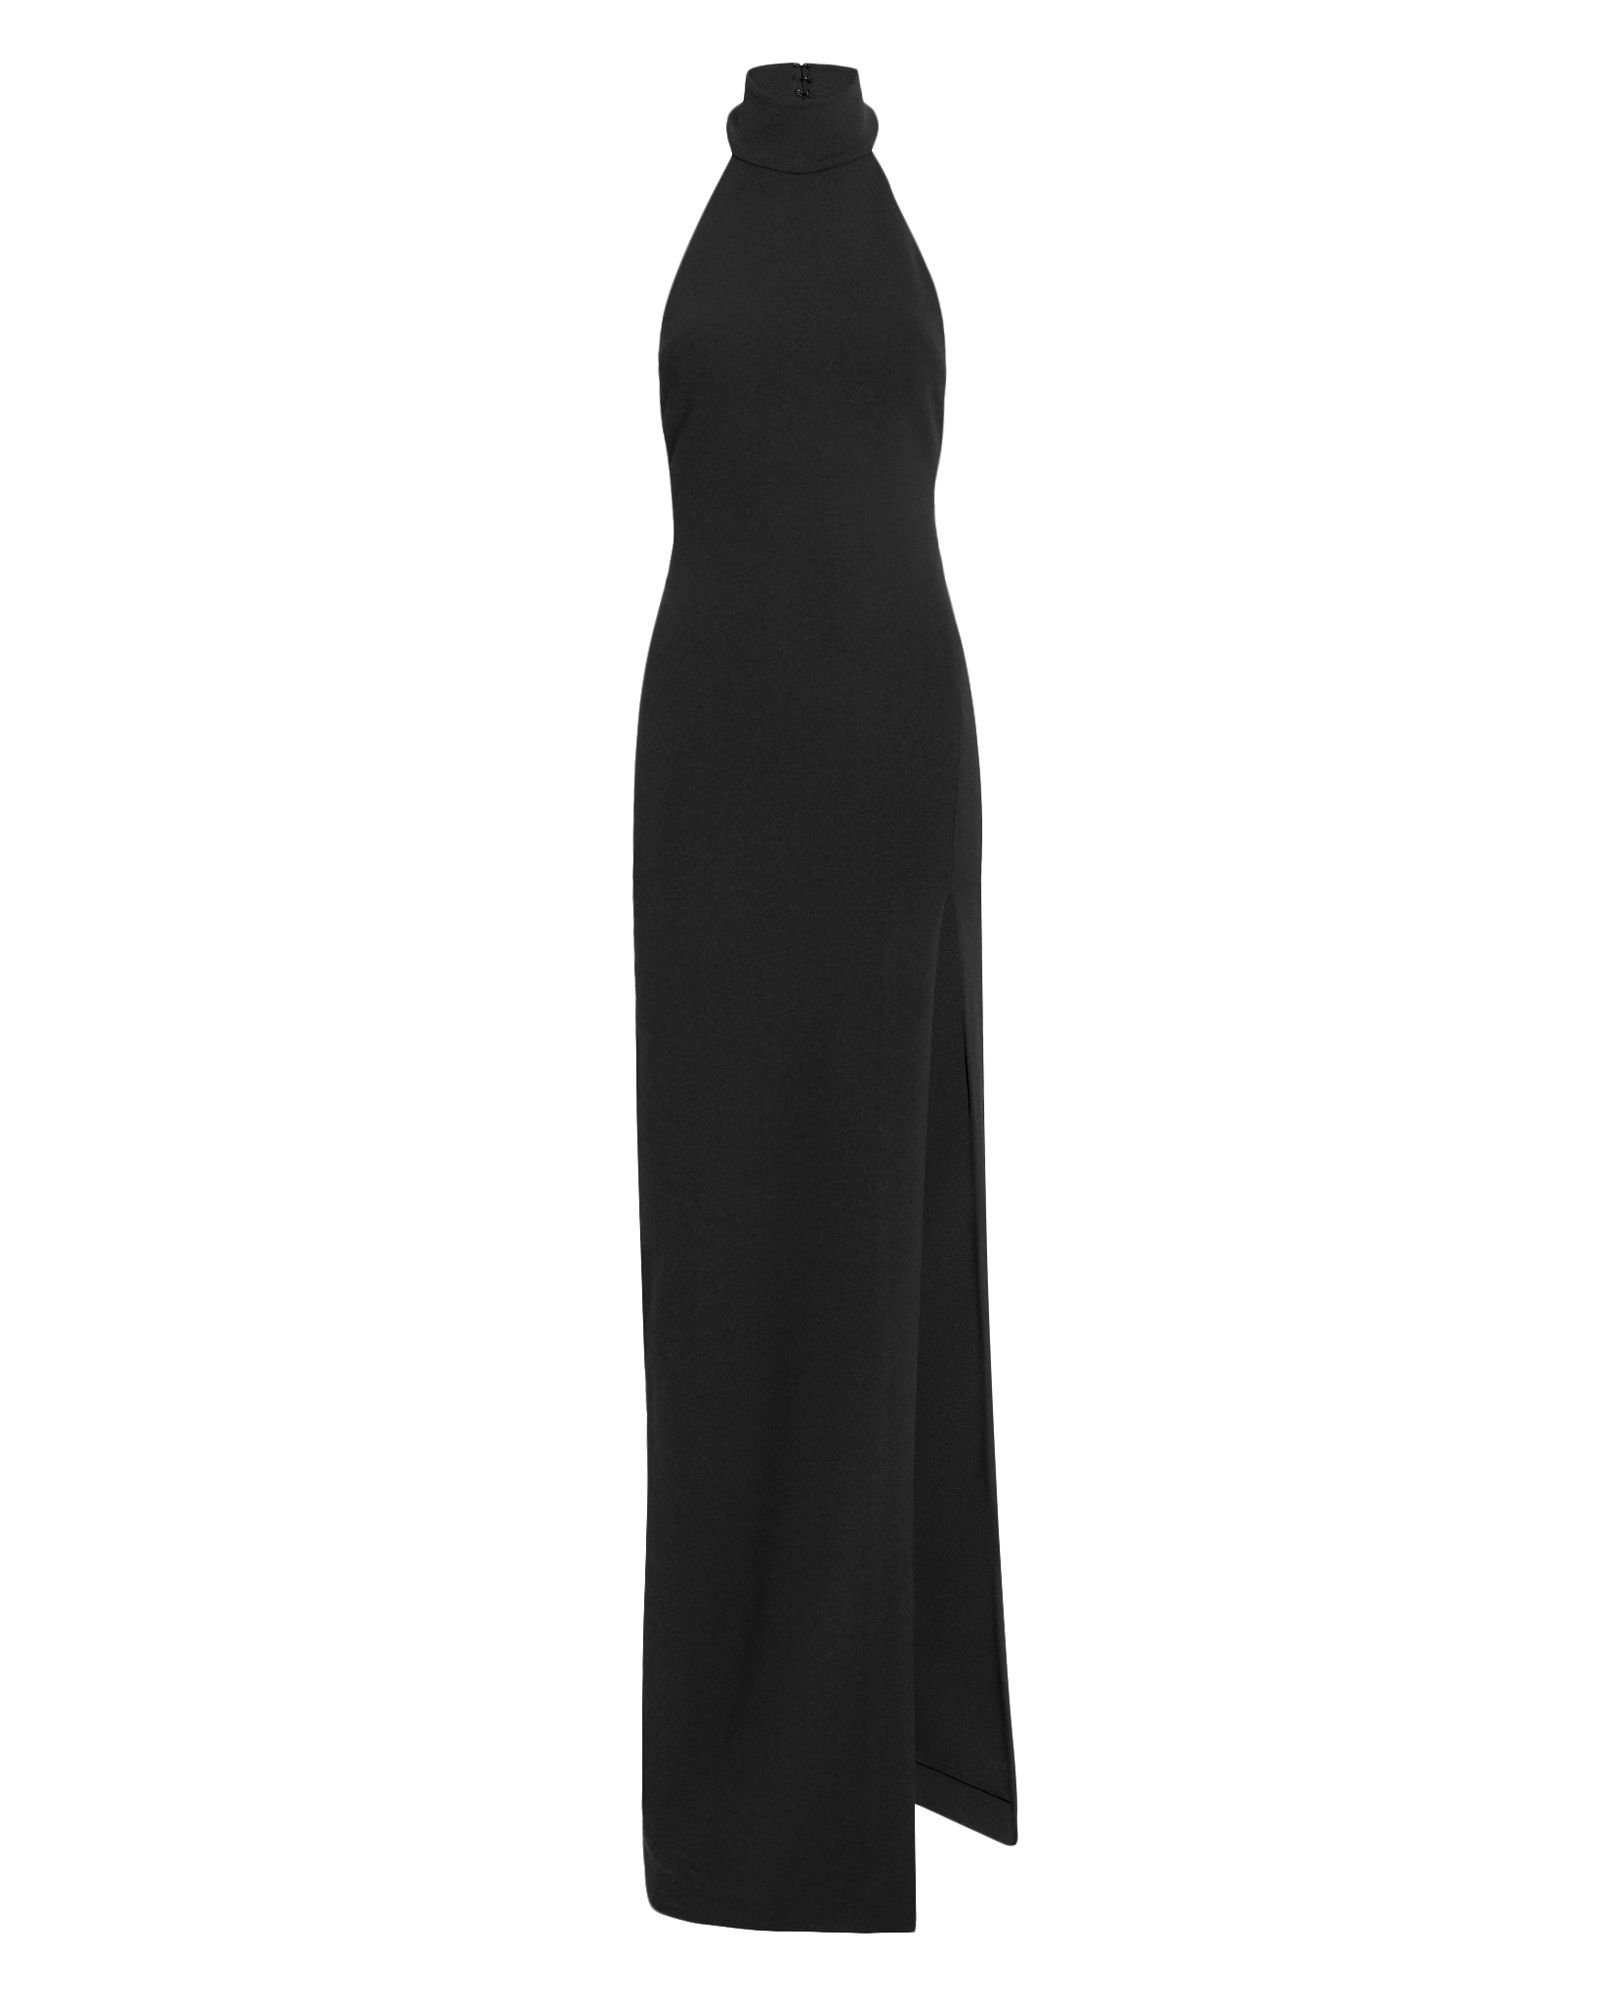 Zadid Black Turtleneck Dress